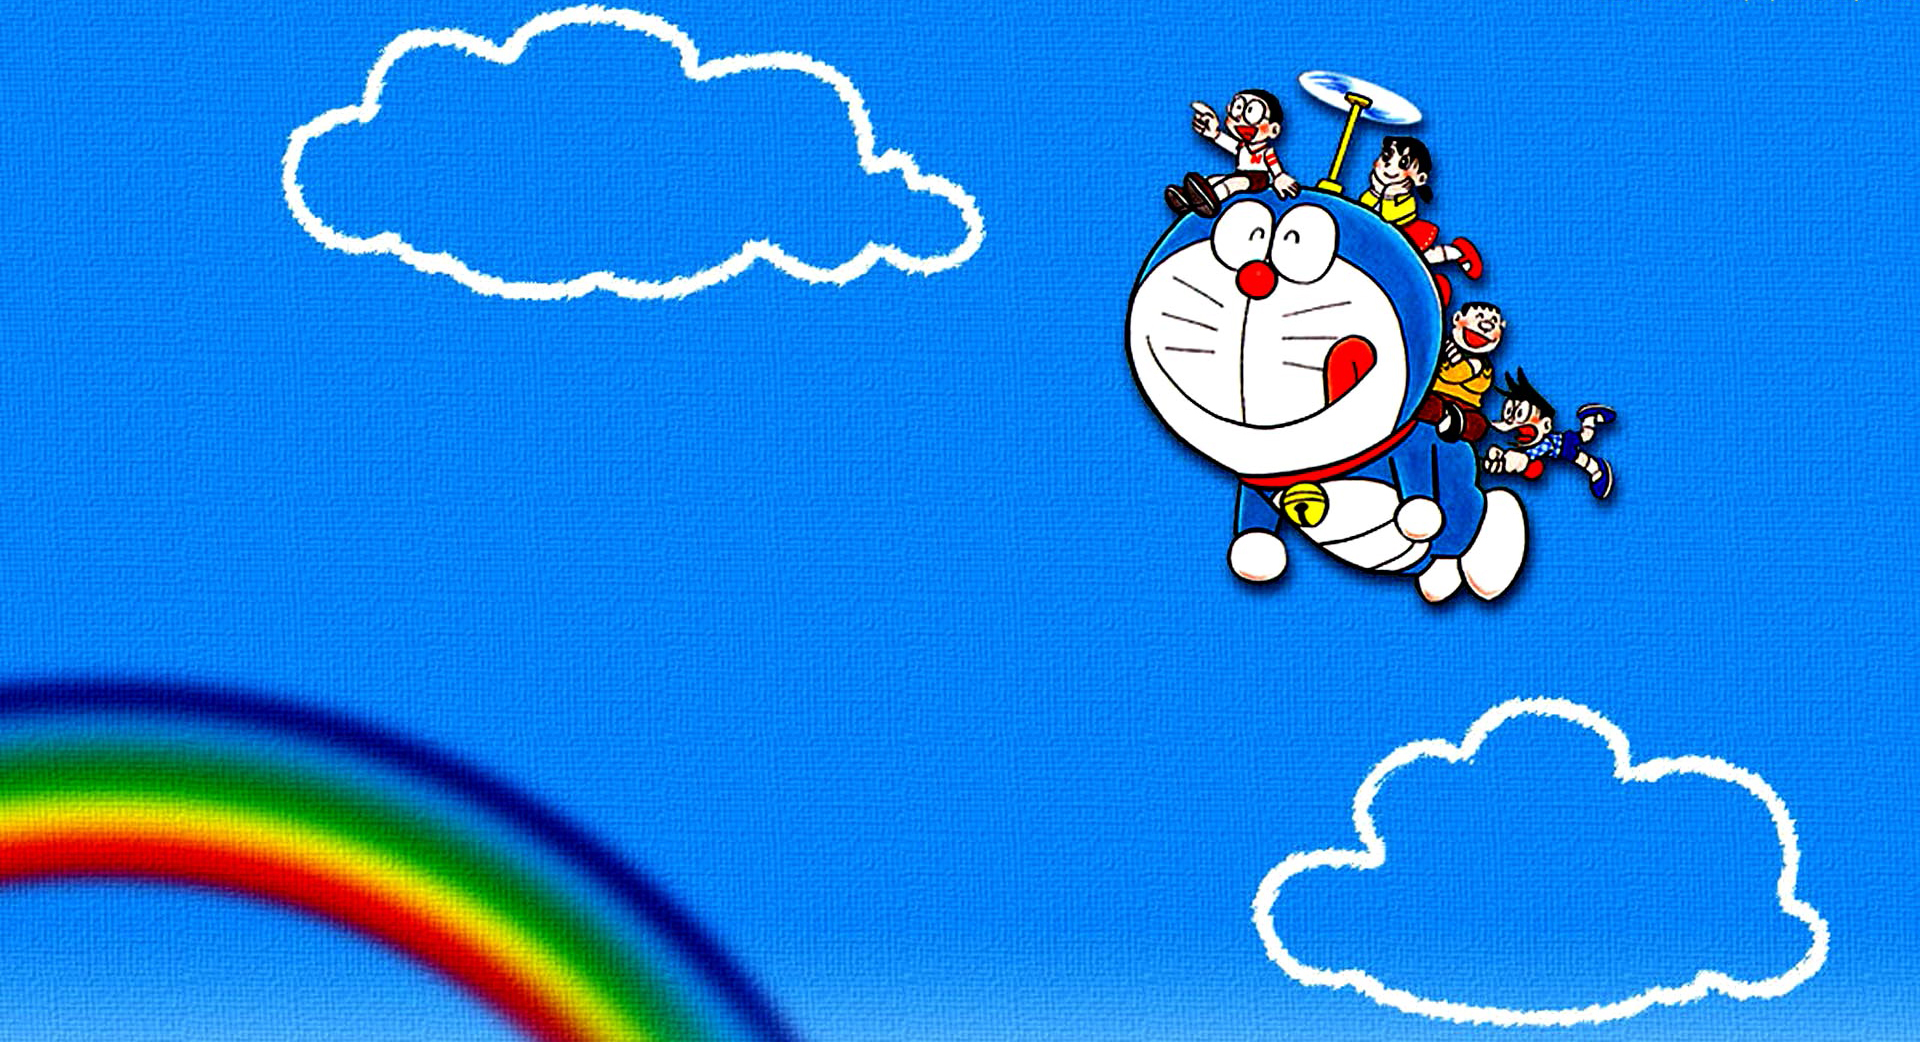 73 ] Wallpapers Doraemon On WallpaperSafari